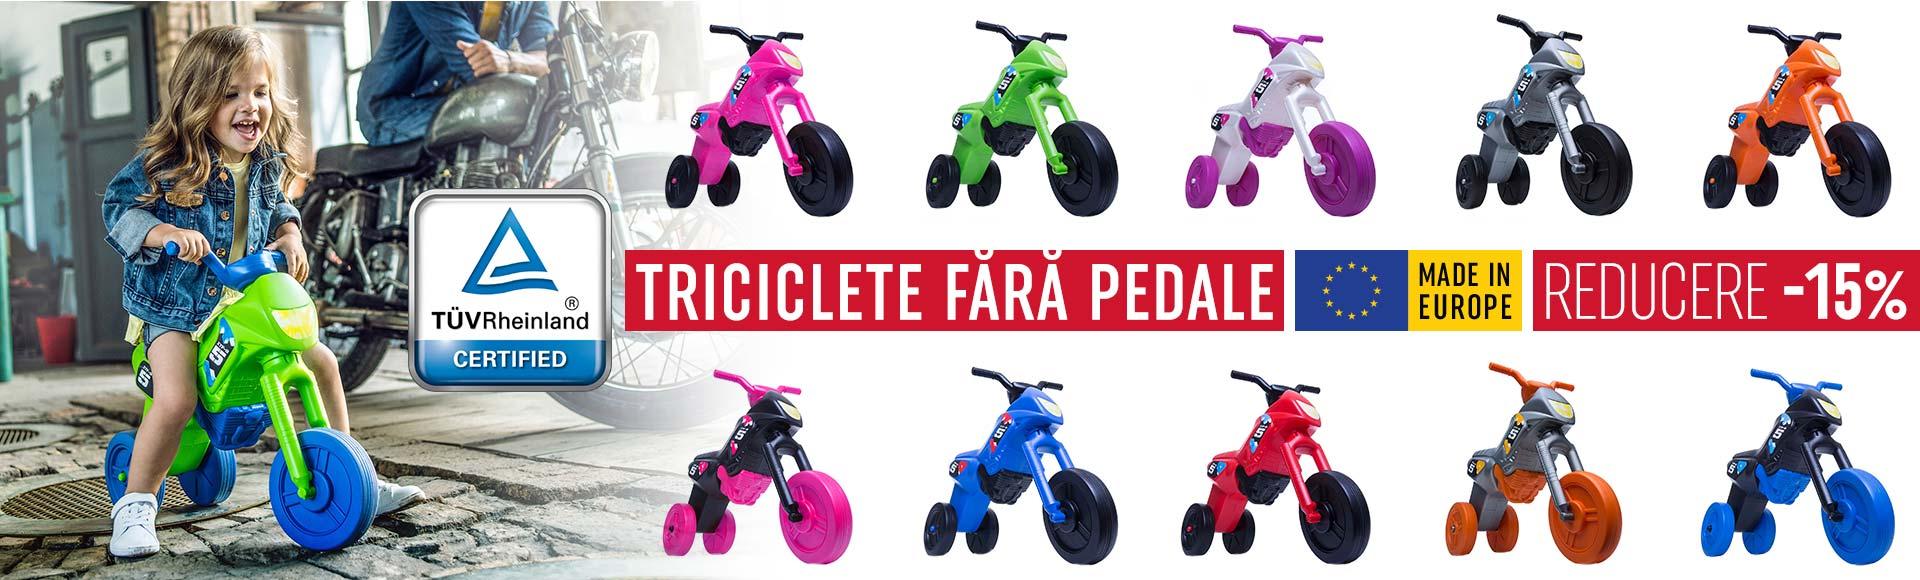 Enduro X - Triciclete fara pedale 2019